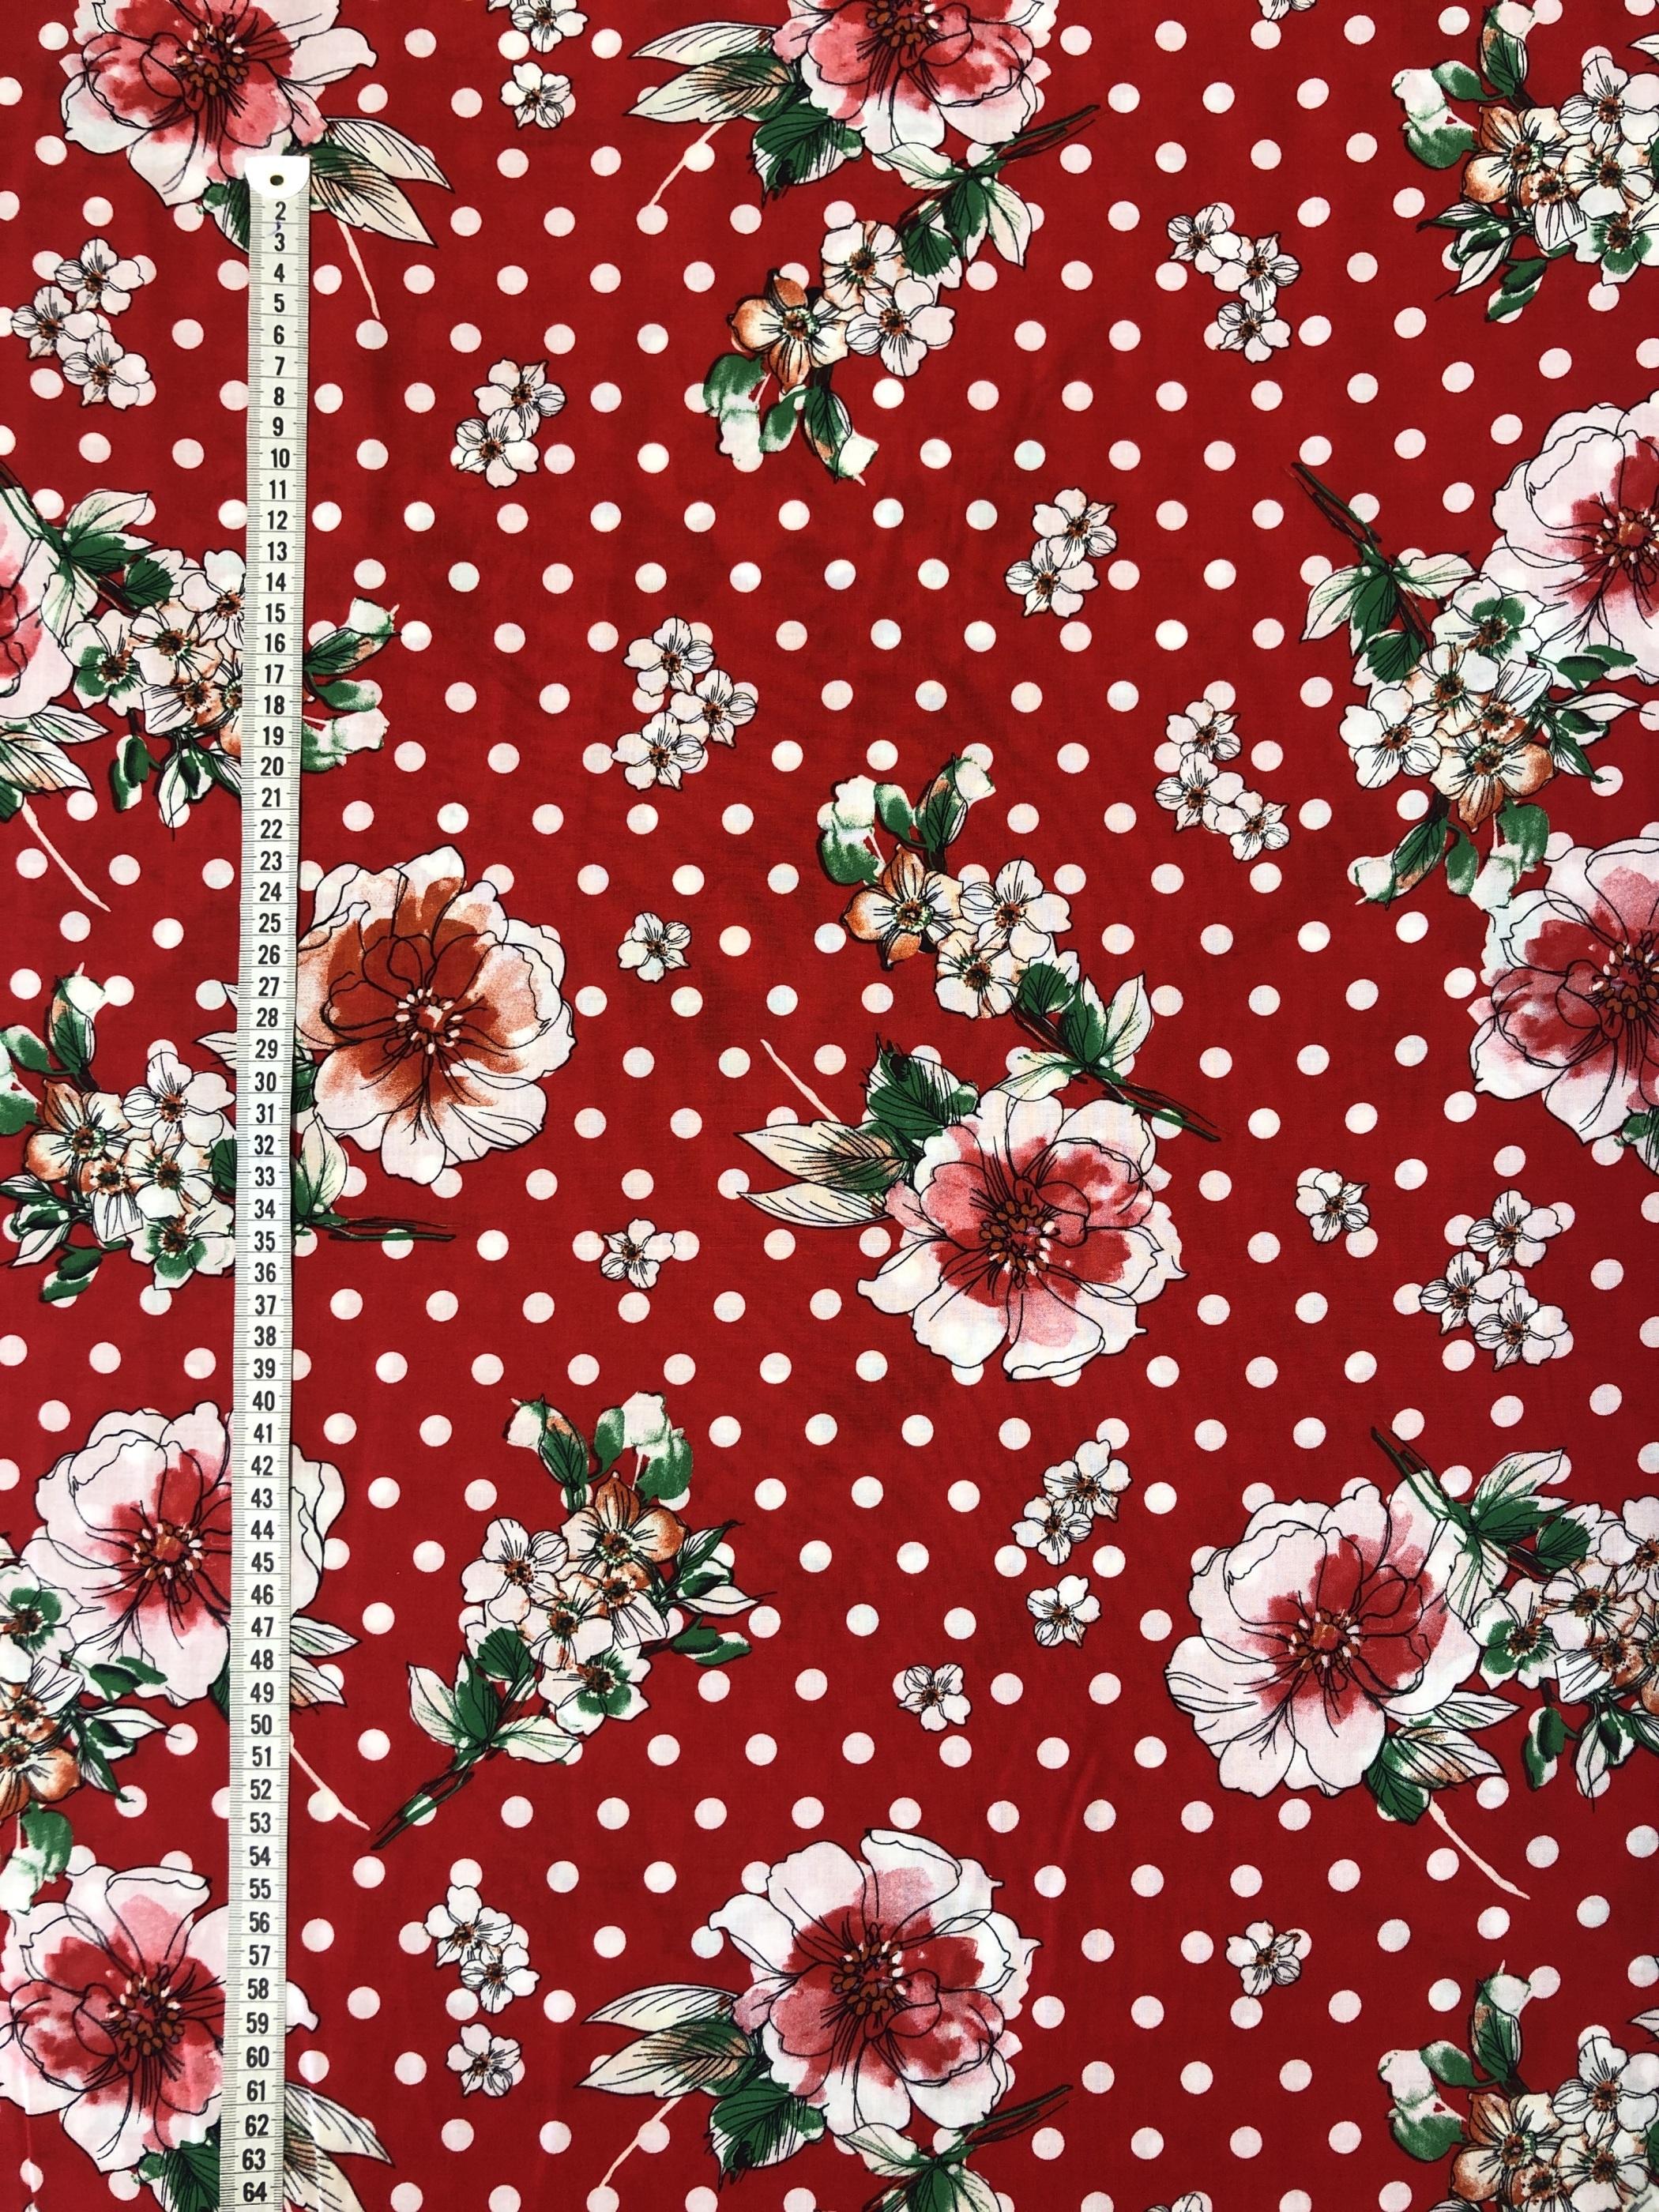 Blommigt blommor prickigt prick röd britt viskos modetyg metervara Laholm Tyglust